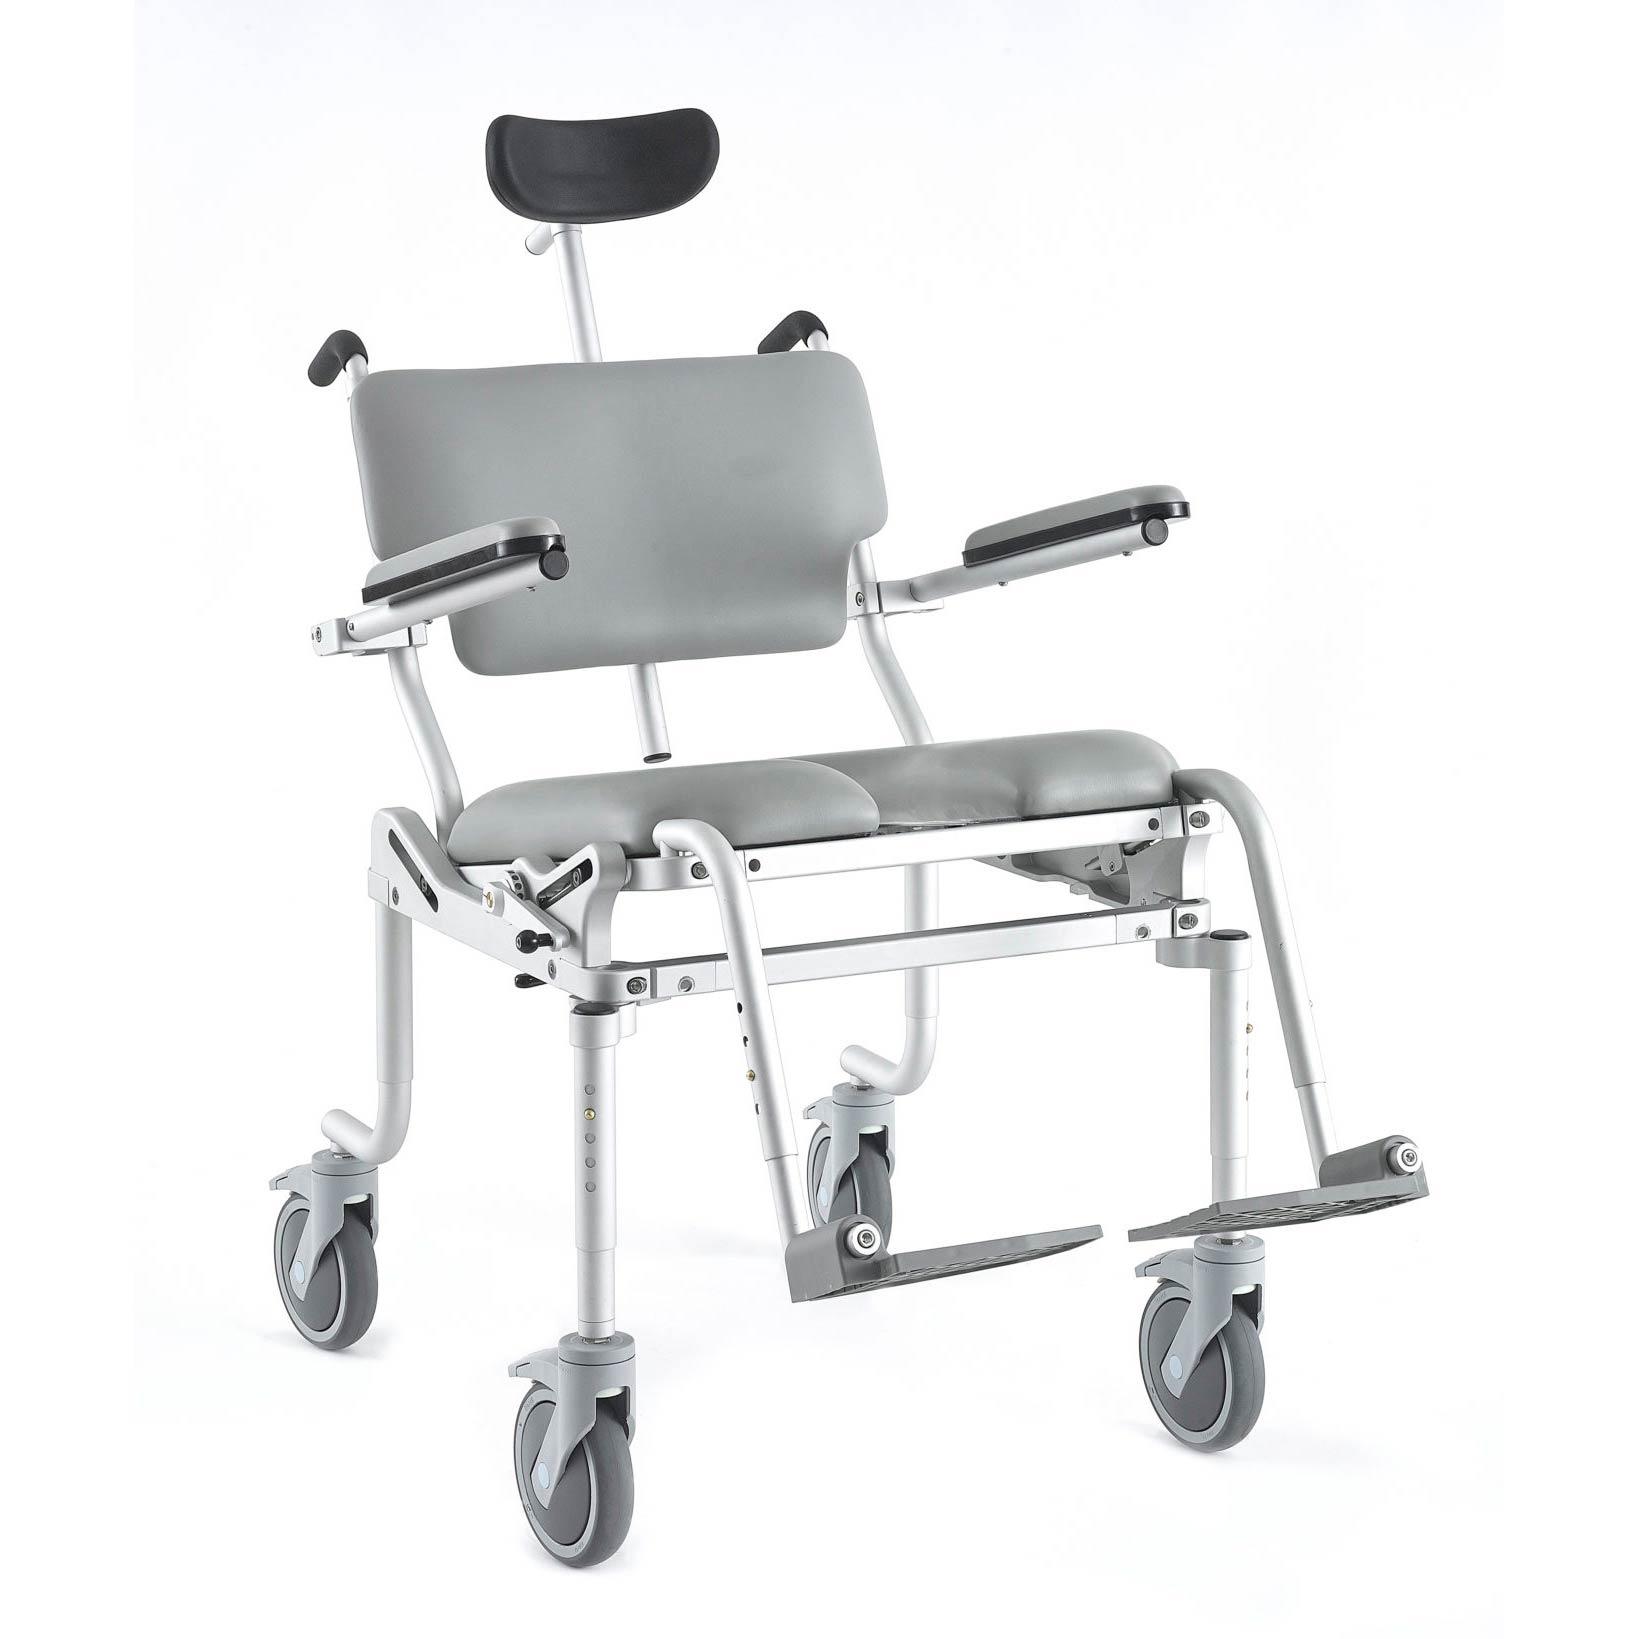 Nuprodx 4200 Tilt Roll-In-Shower Commode Chair | Medicaleshop